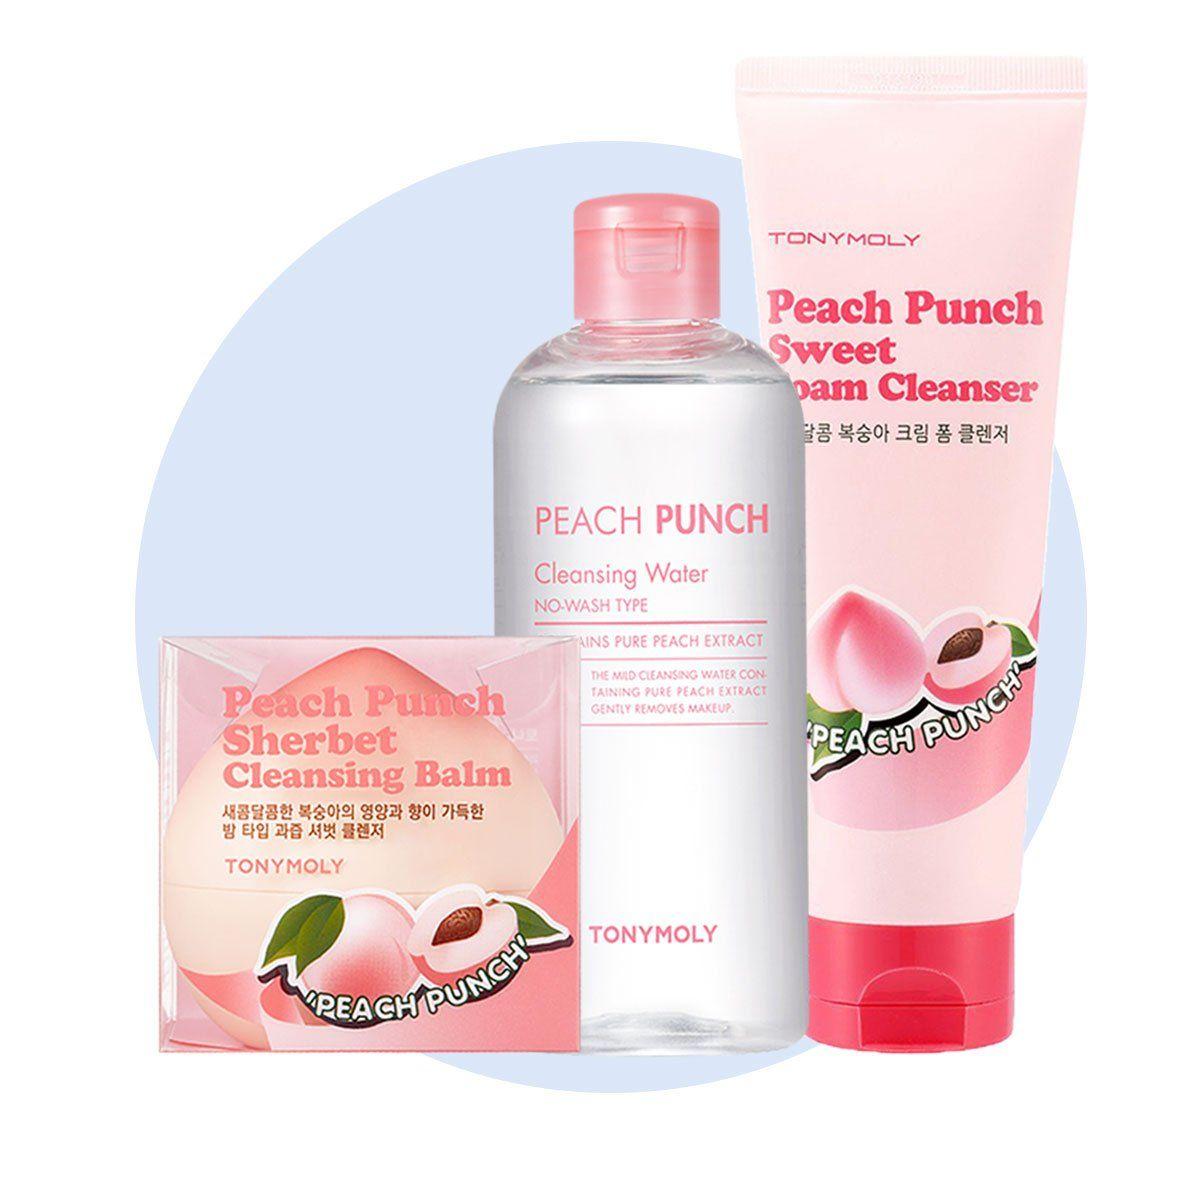 Peach Punch Cleansing Set Cleansing Balm Peach Skin Care